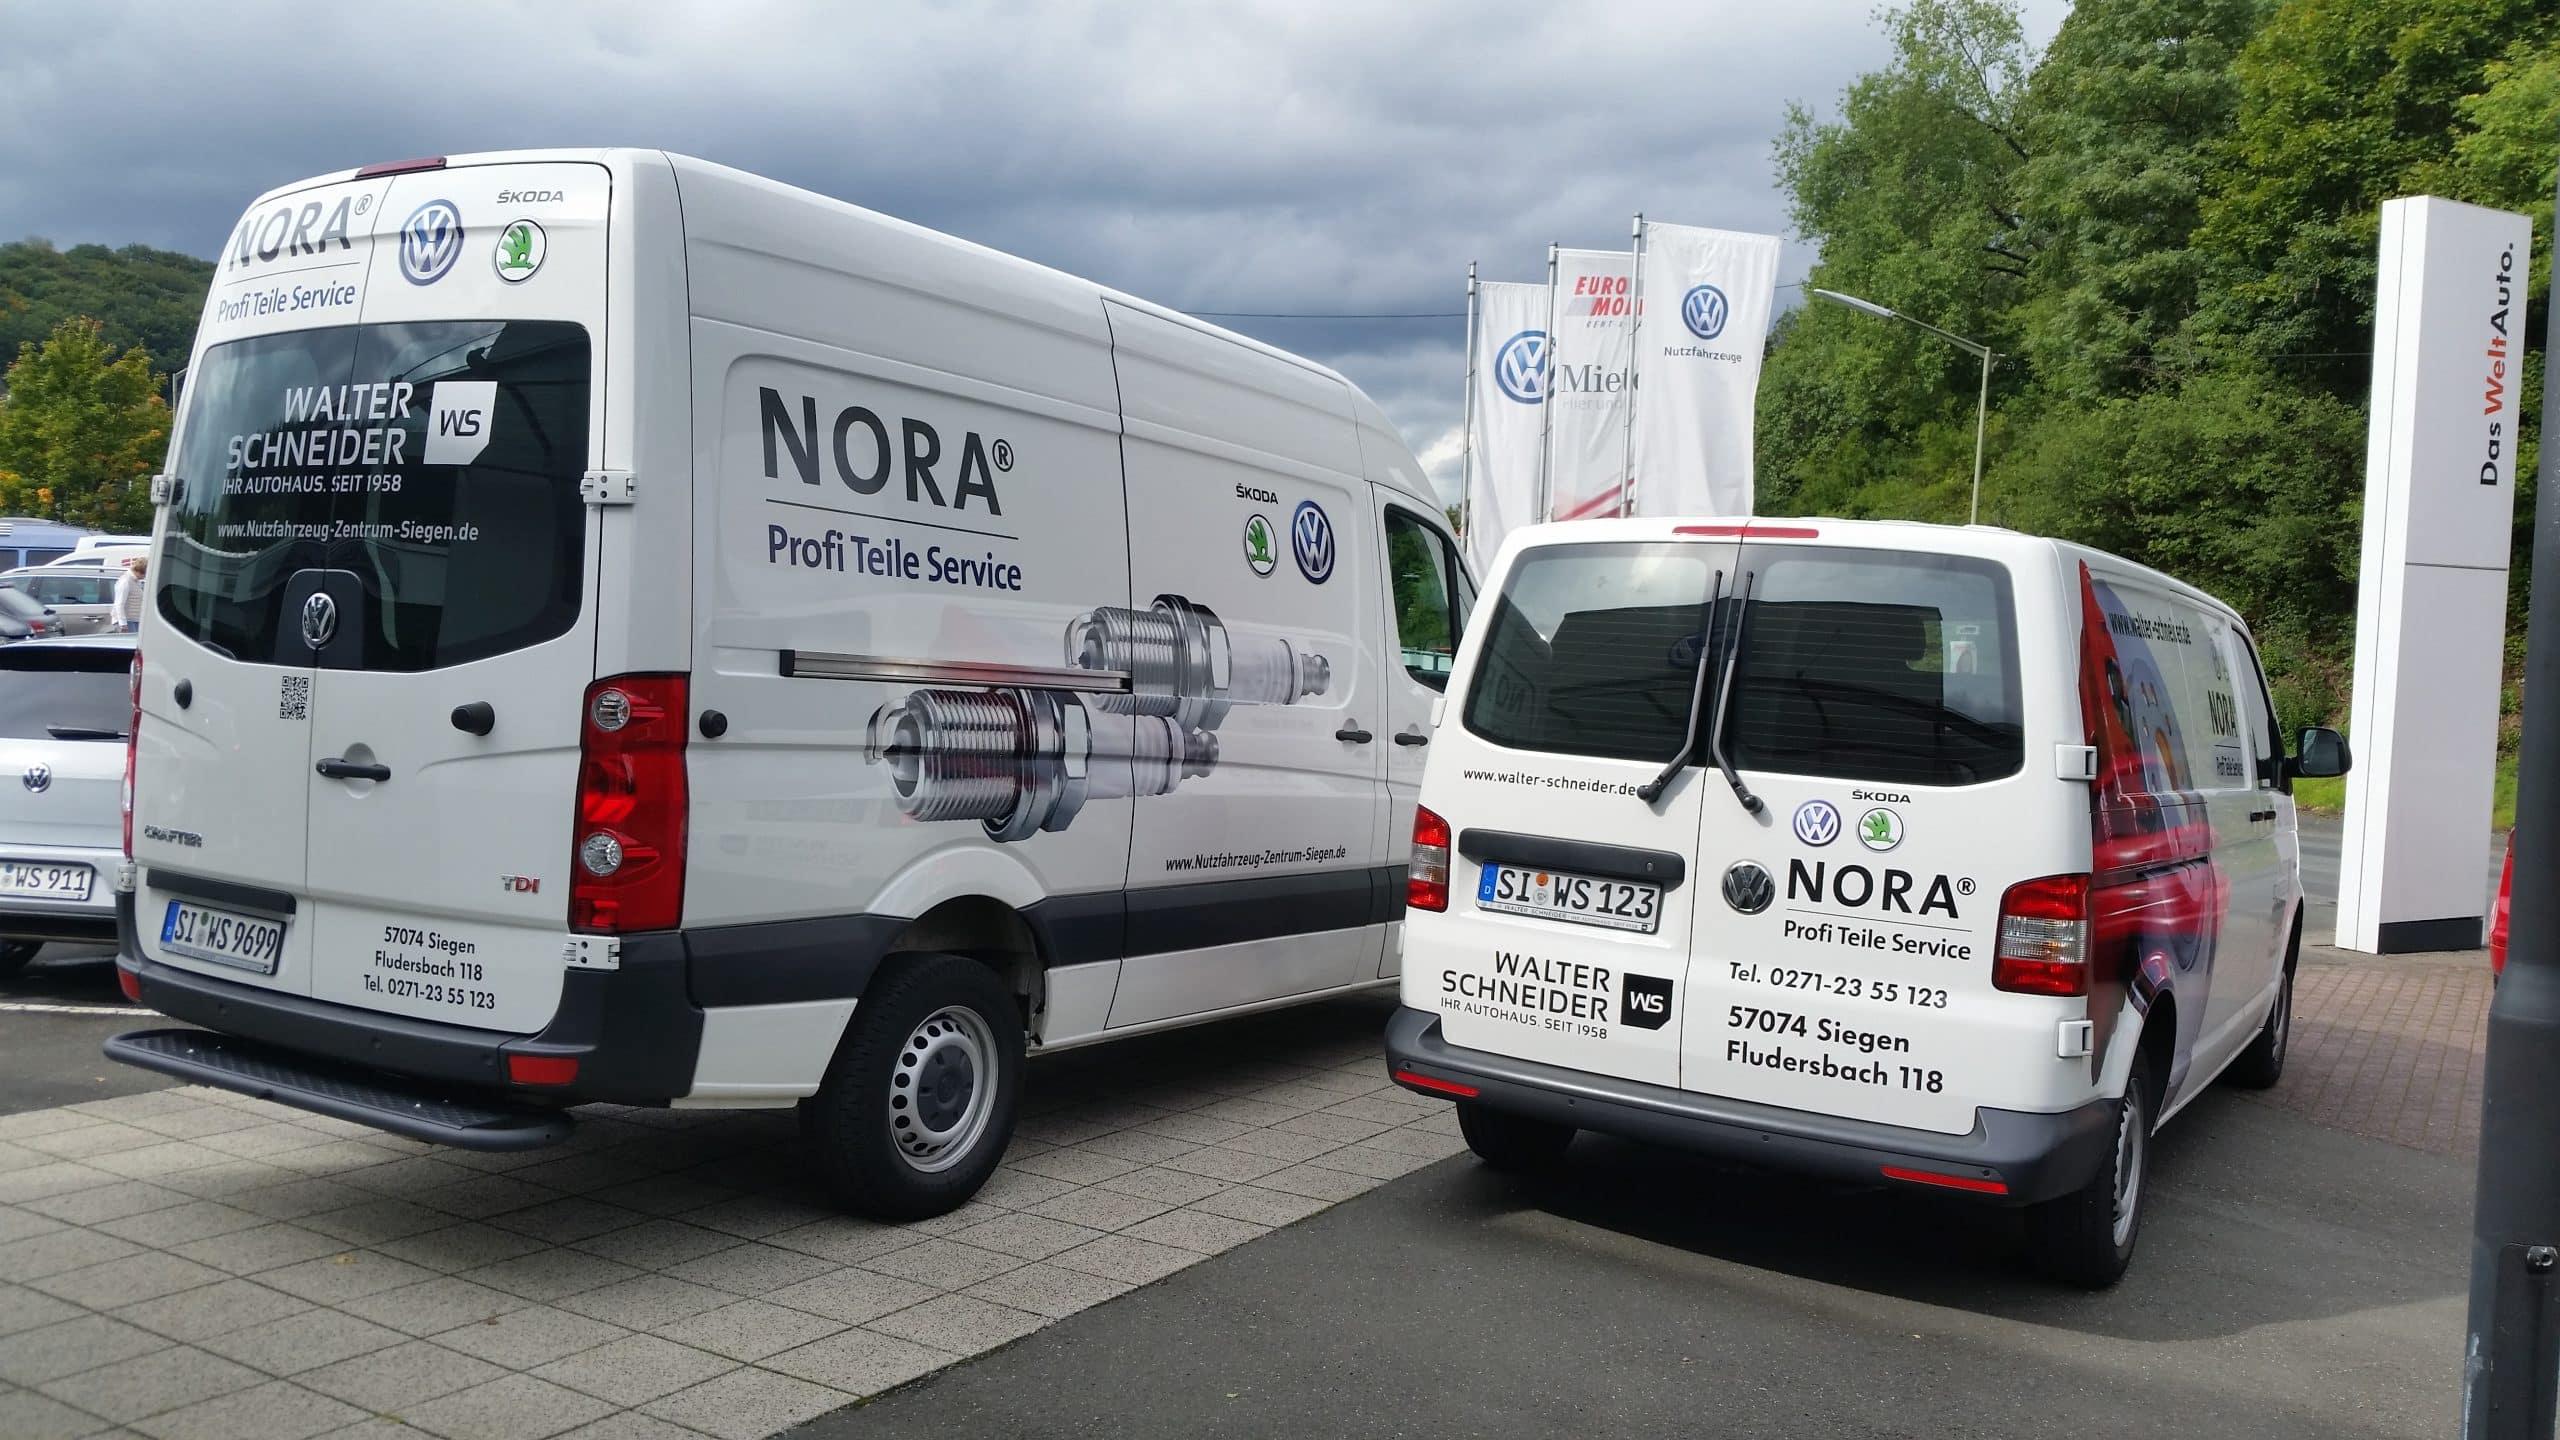 NORA® Profi Teile Service in Siegen-Fludersbach